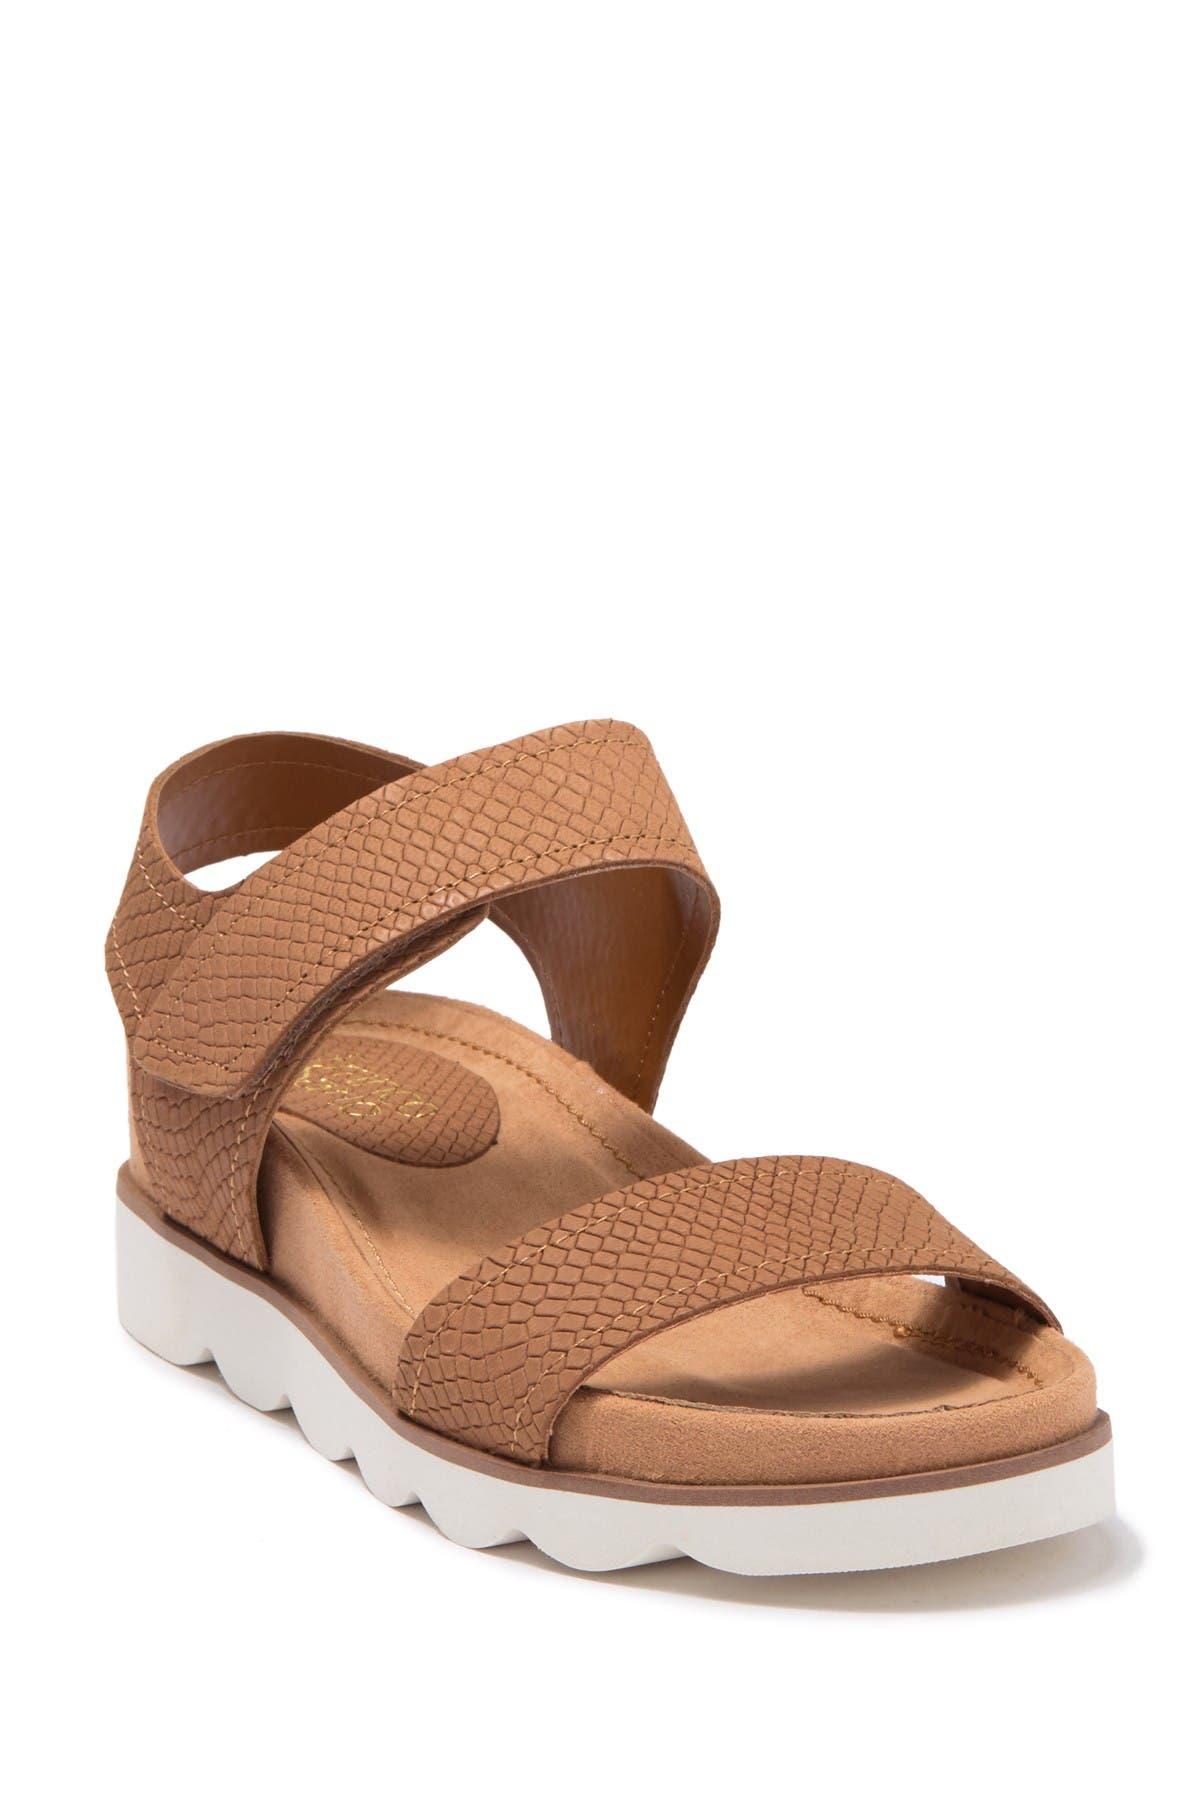 Image of Franco Sarto India Platform Sandal